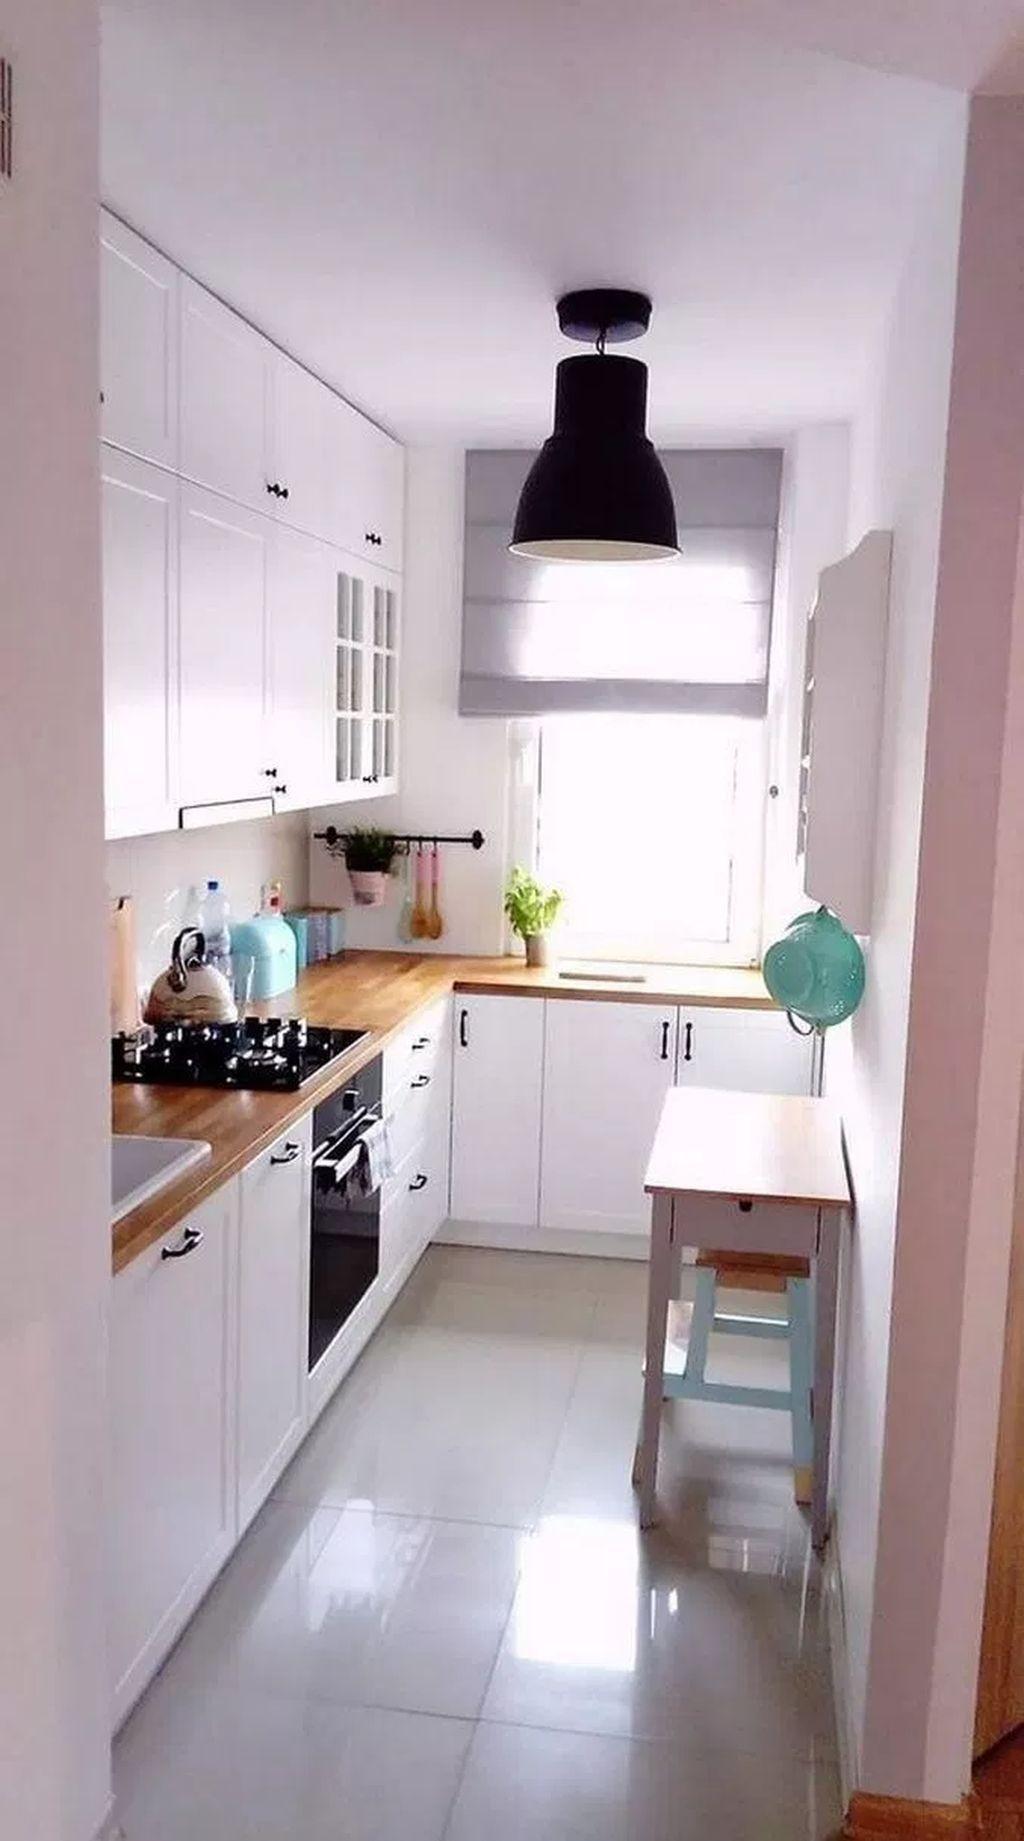 27 Easy And Simple Apartment Kitchen Design Ideas Kitchen Design Small Small Kitchen Decor Small Apartment Kitchen